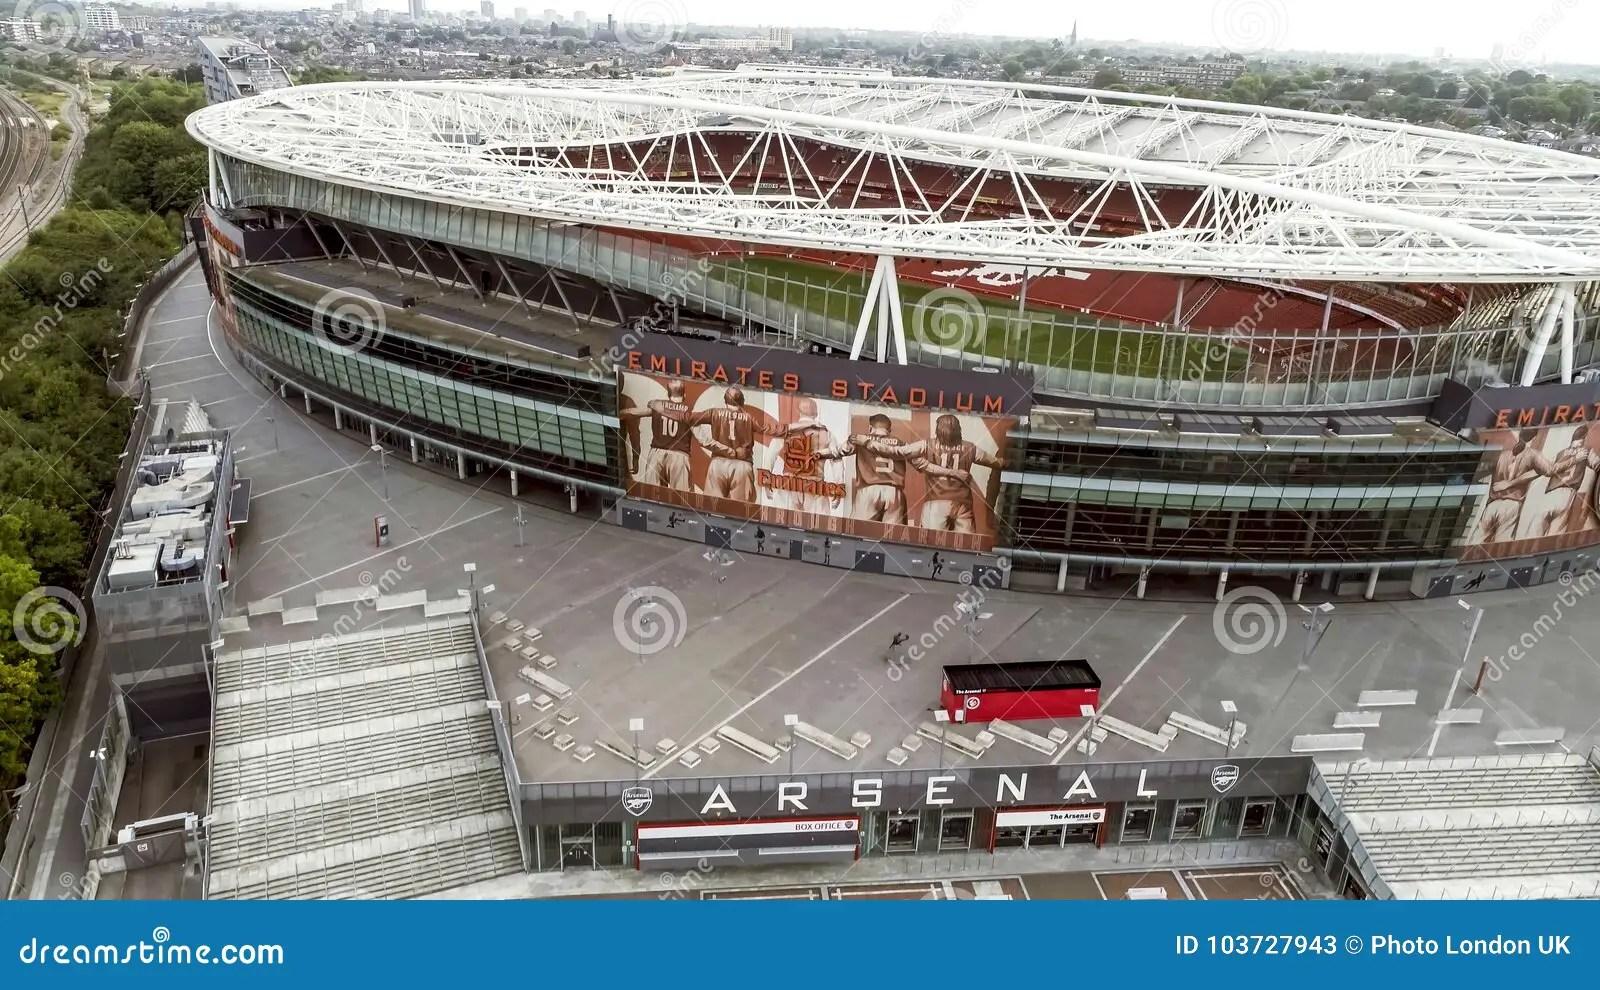 https de dreamstime com fliegen durch vogelperspektive ikonenhaftes arsenal emirates stadium london image103727943